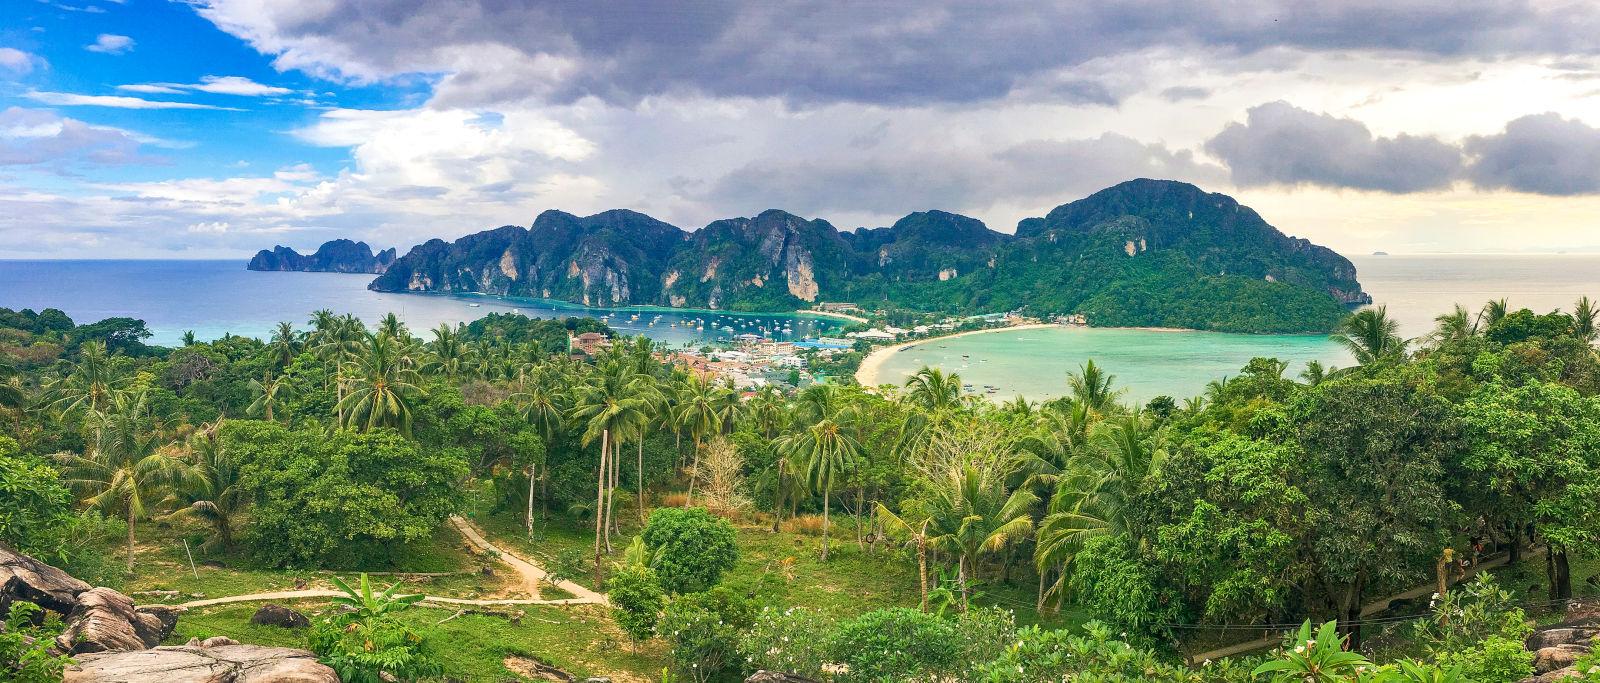 Luftbild von Ko Phi Phi